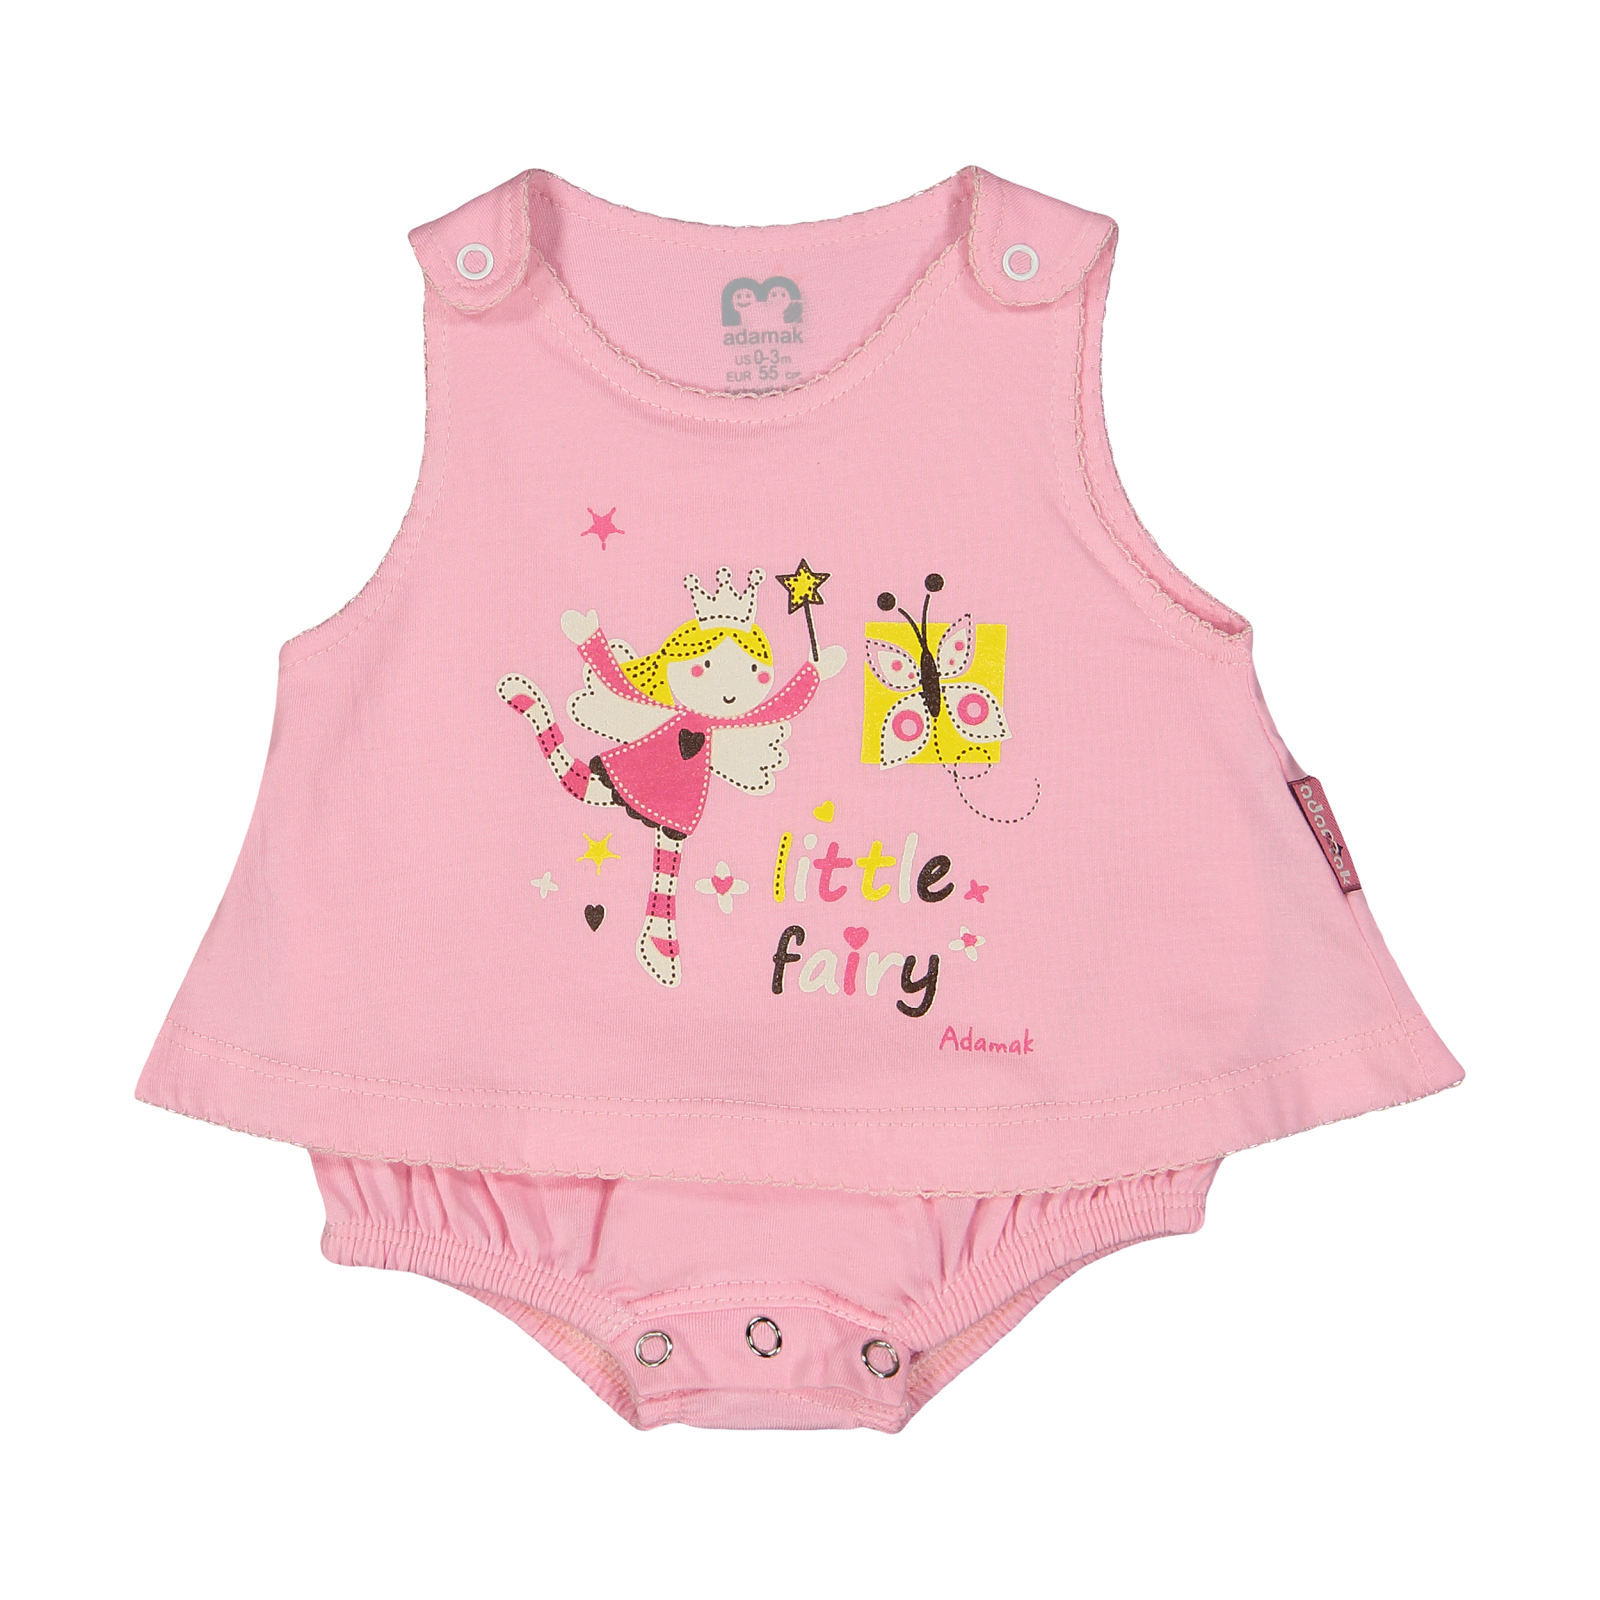 سرهمی نوزادی دخترانه آدمک مدل 2171108-84 -  - 2